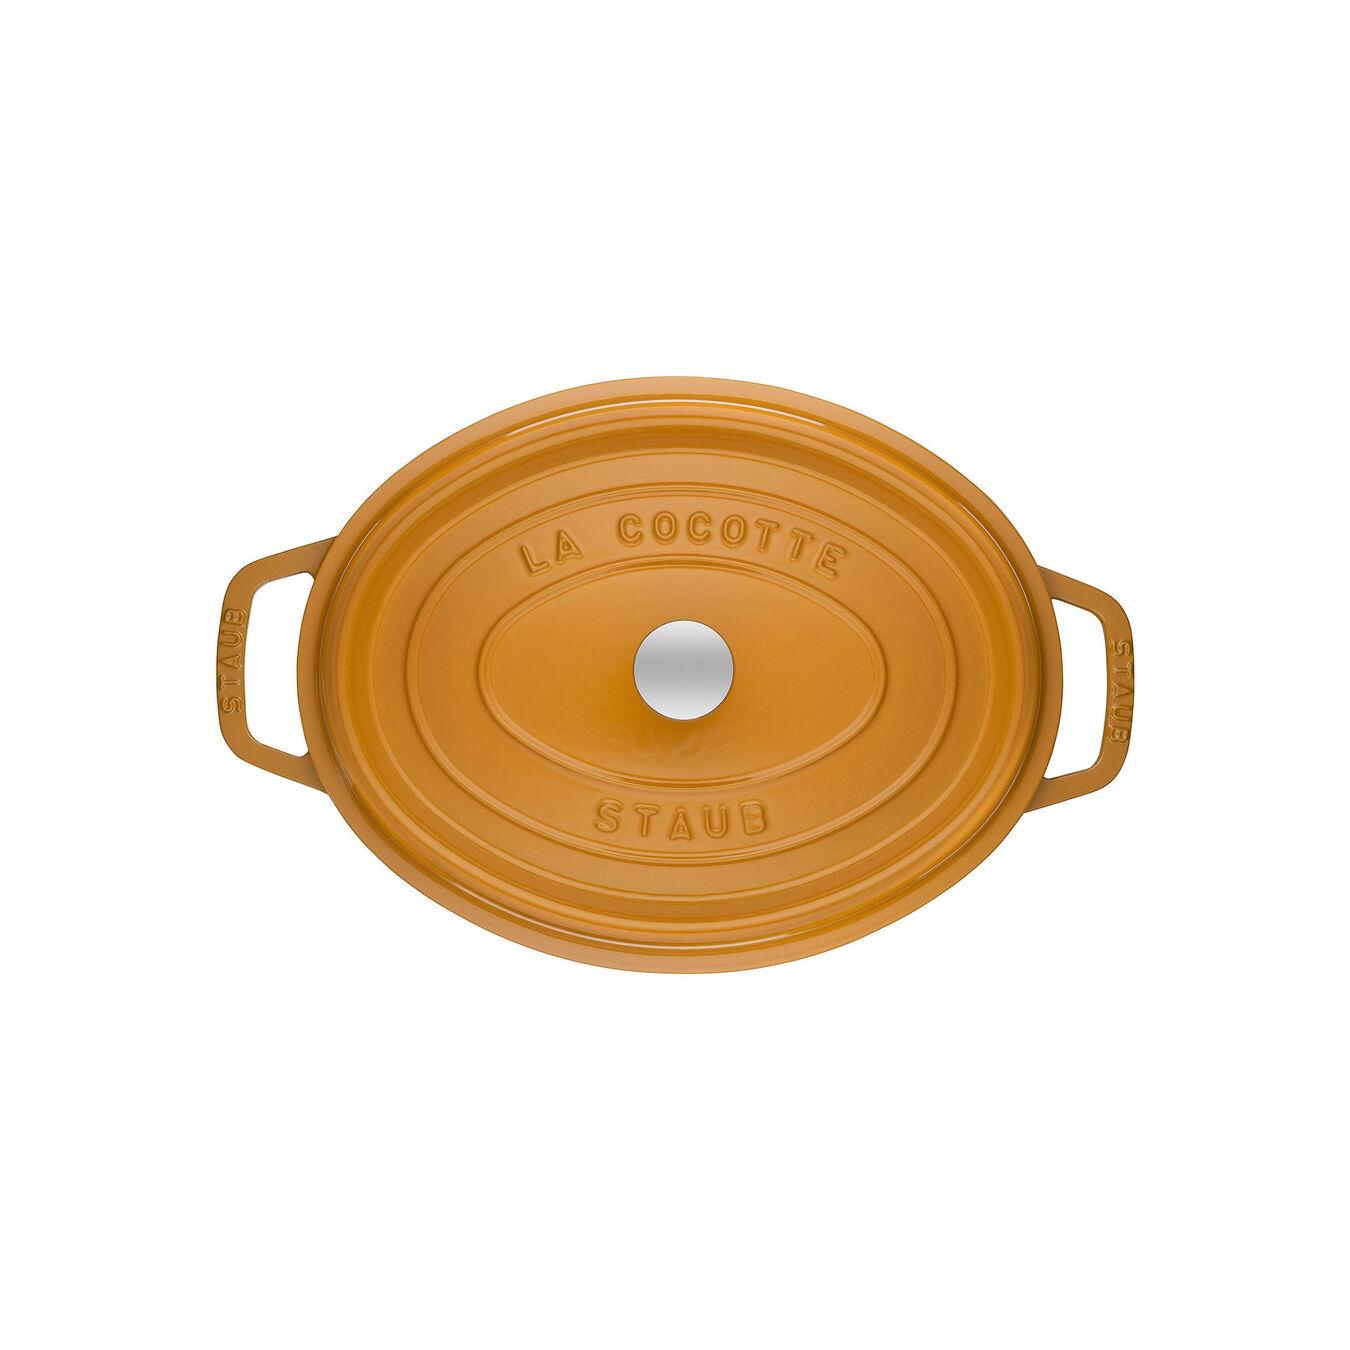 Cocotte 31 cm, Ovale, Moutarde, Fonte,,large 2